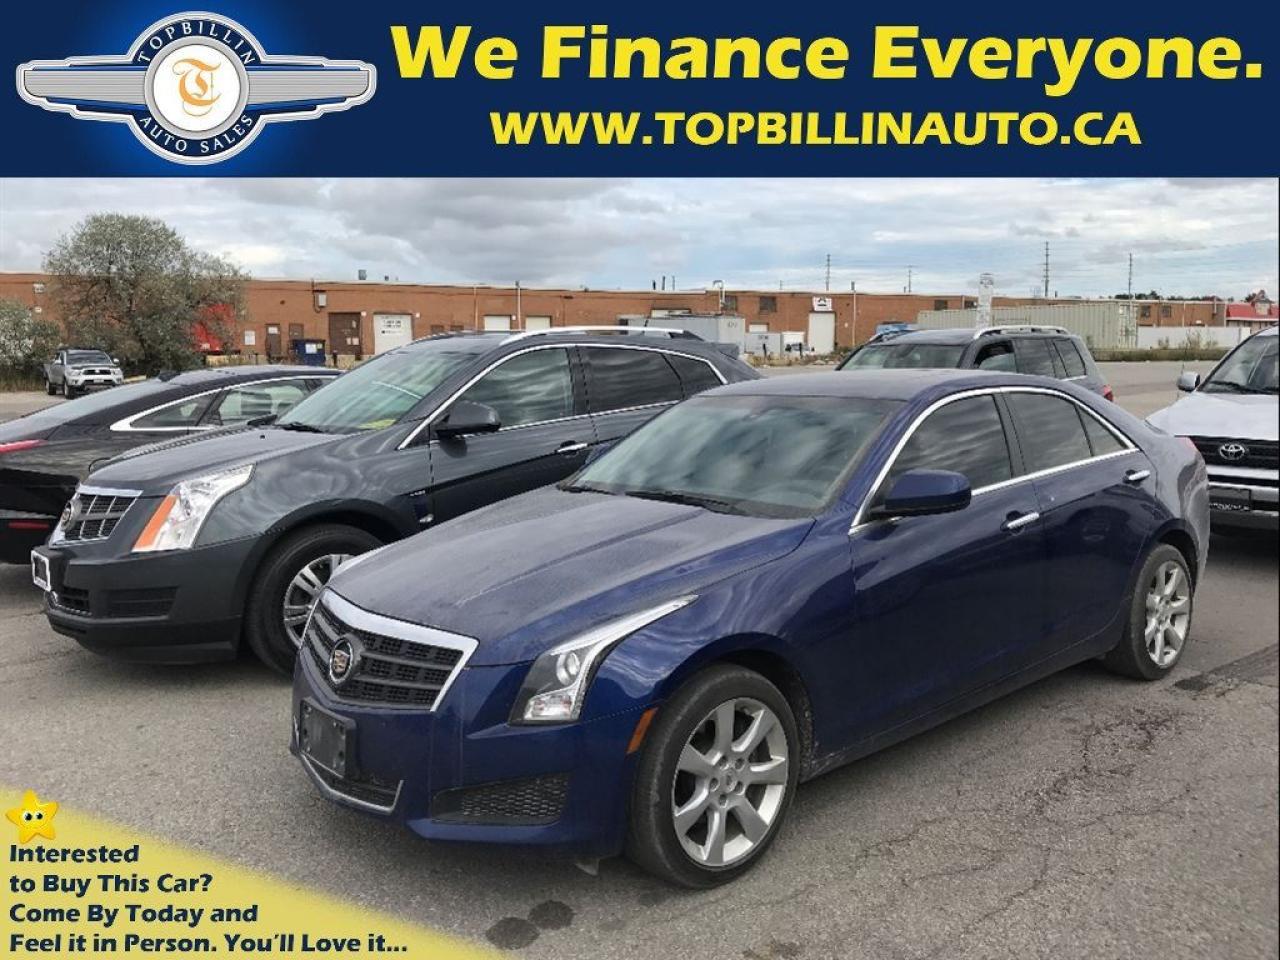 2014 Cadillac ATS 2.0L Turbo AWD, SUNROOF